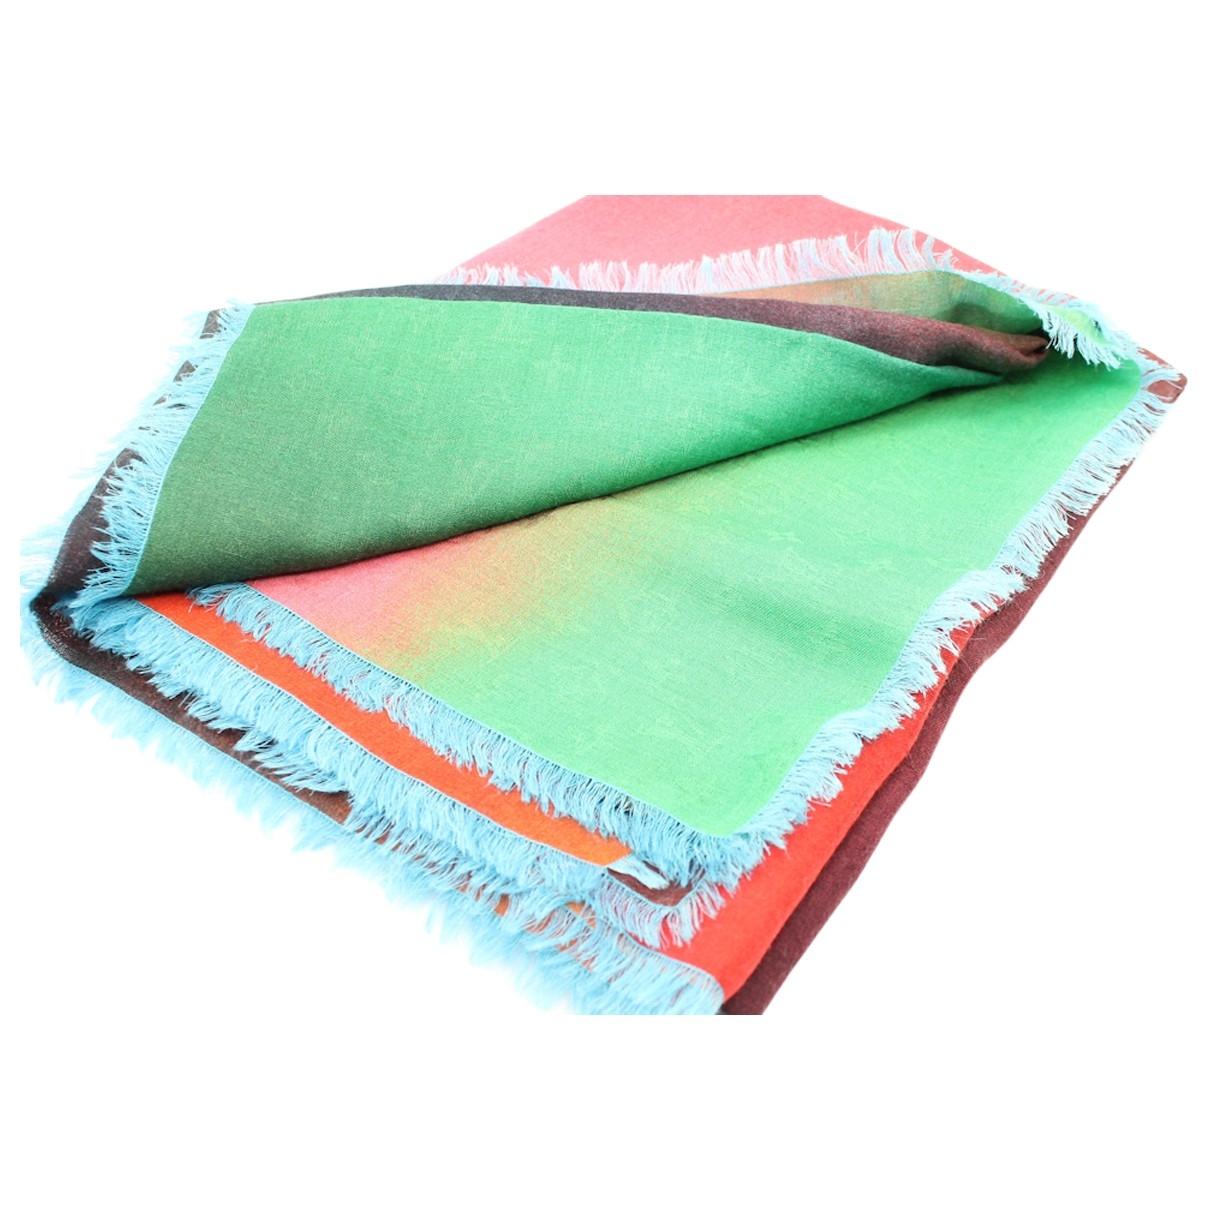 Louis Vuitton \N Multicolour Cashmere scarf for Women \N